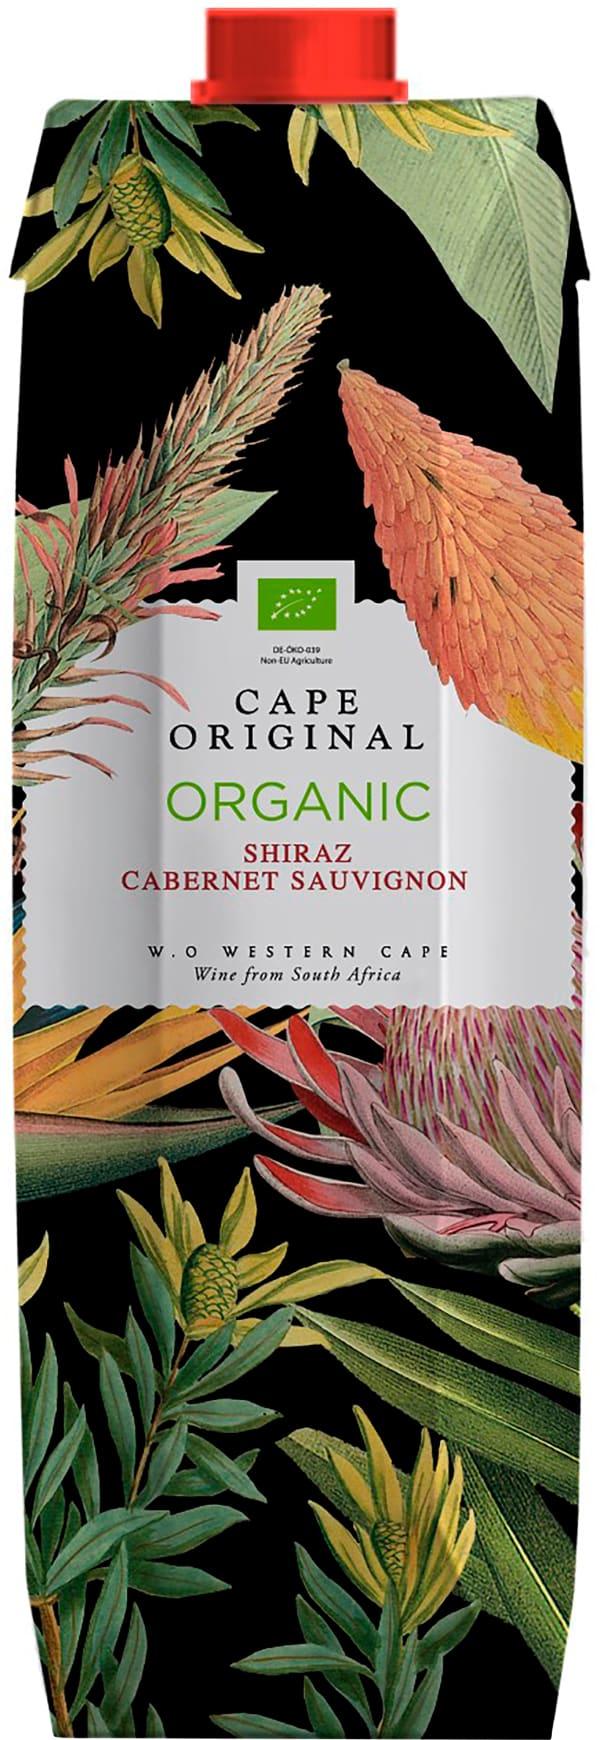 Cape Original Shiraz Cabernet Sauvignon Organic 2020 kartongförpackning